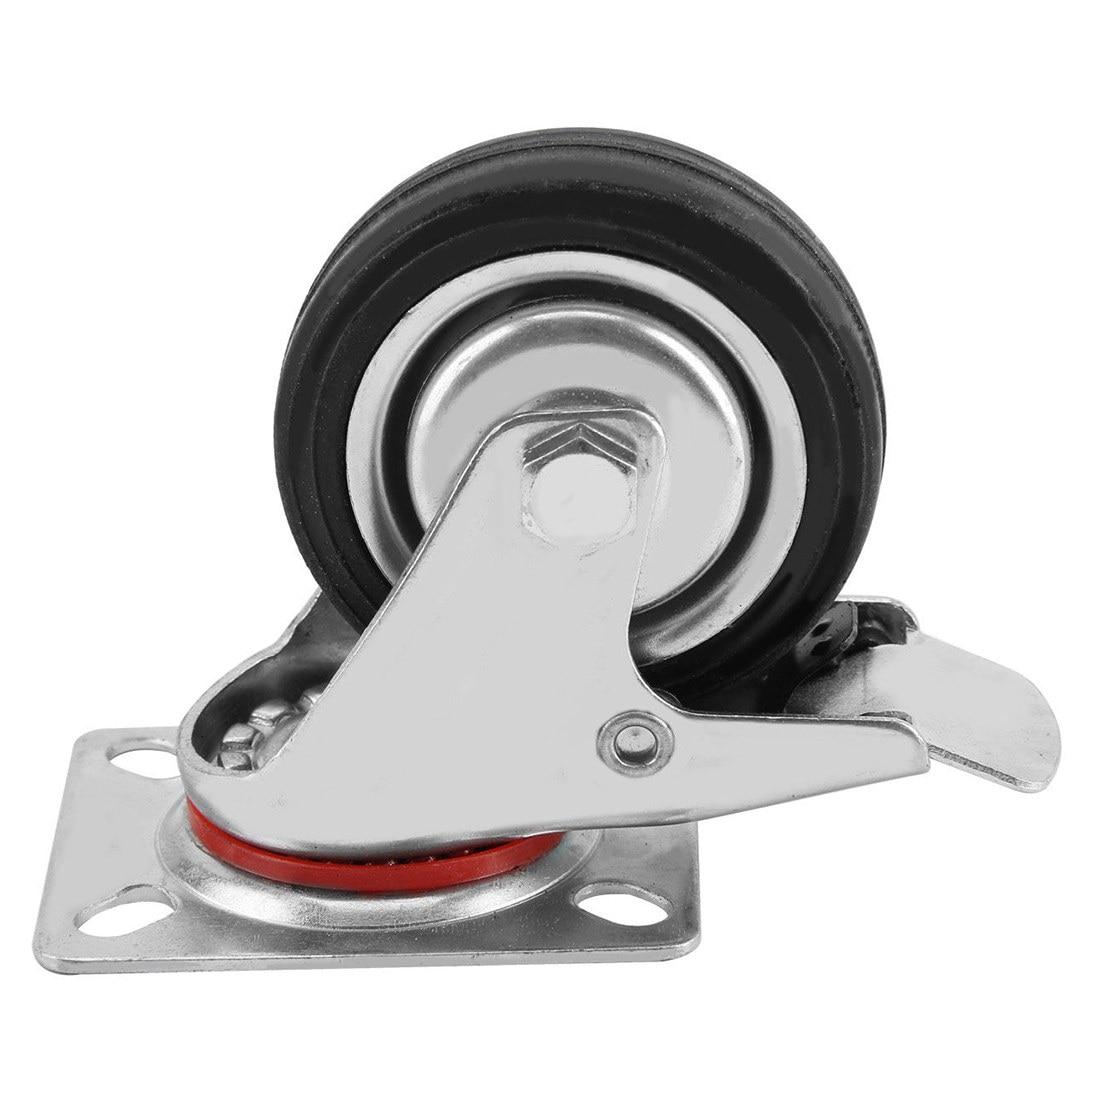 New Style 4x75mm New Heavy Duty Rubber Swivel Castor Wheels Brake Trolley Furniture Caster ys 138no nc ansi standard heavy duty electric strike size 124 x 32 x 33 mm